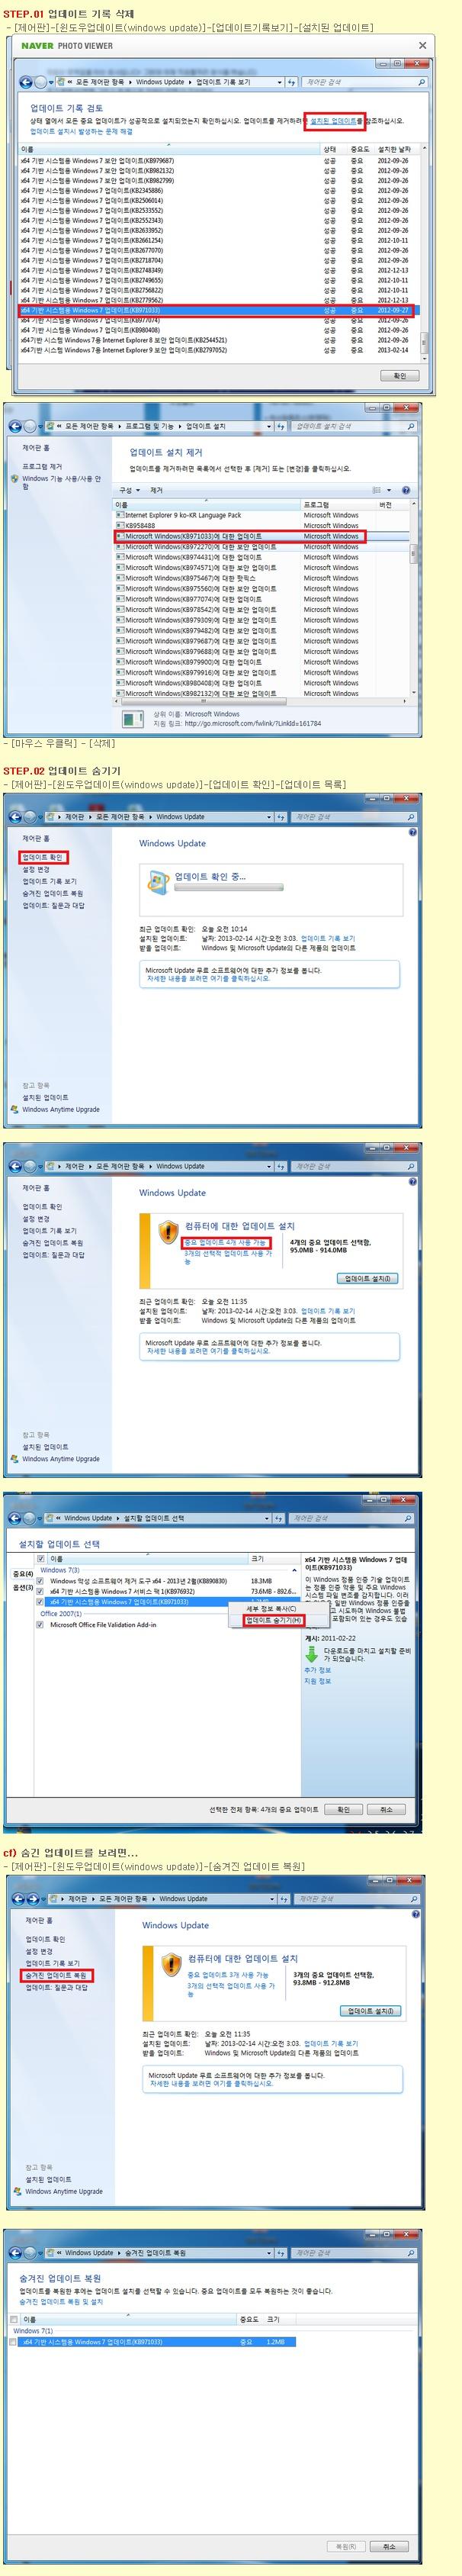 blog_me_20130803_134816.jpg